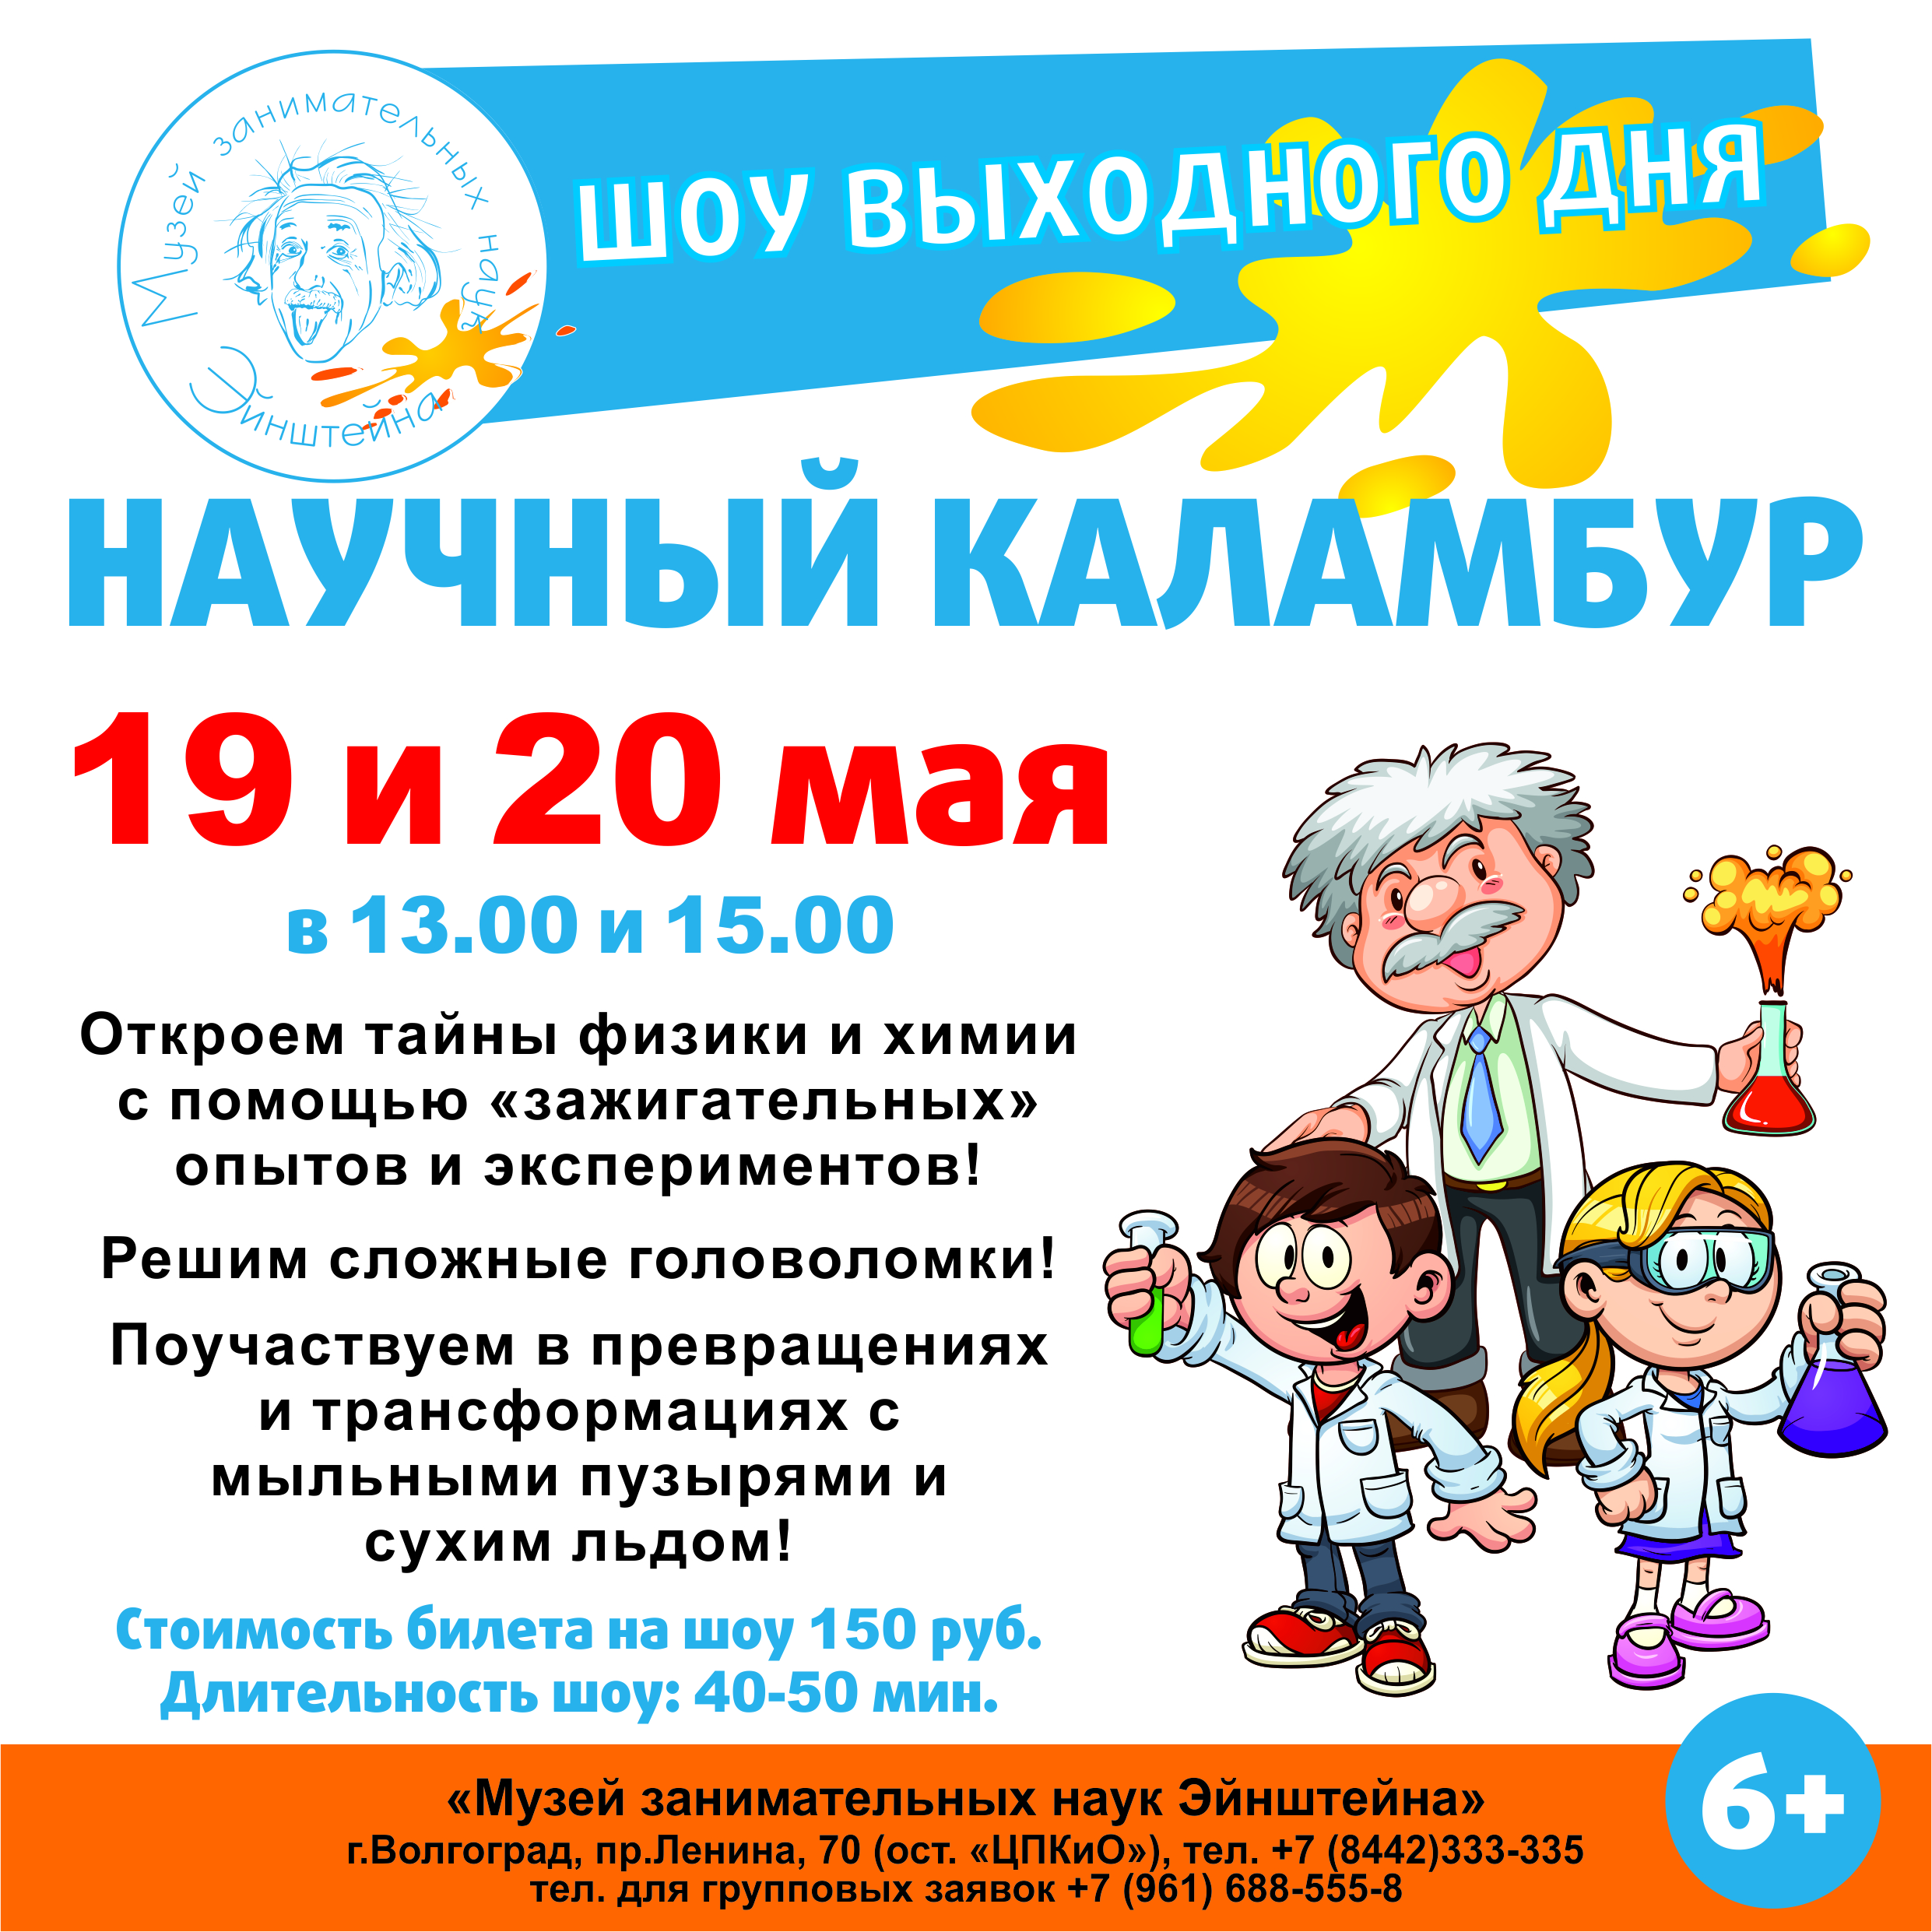 Научный каламбур_19 и 20 мая